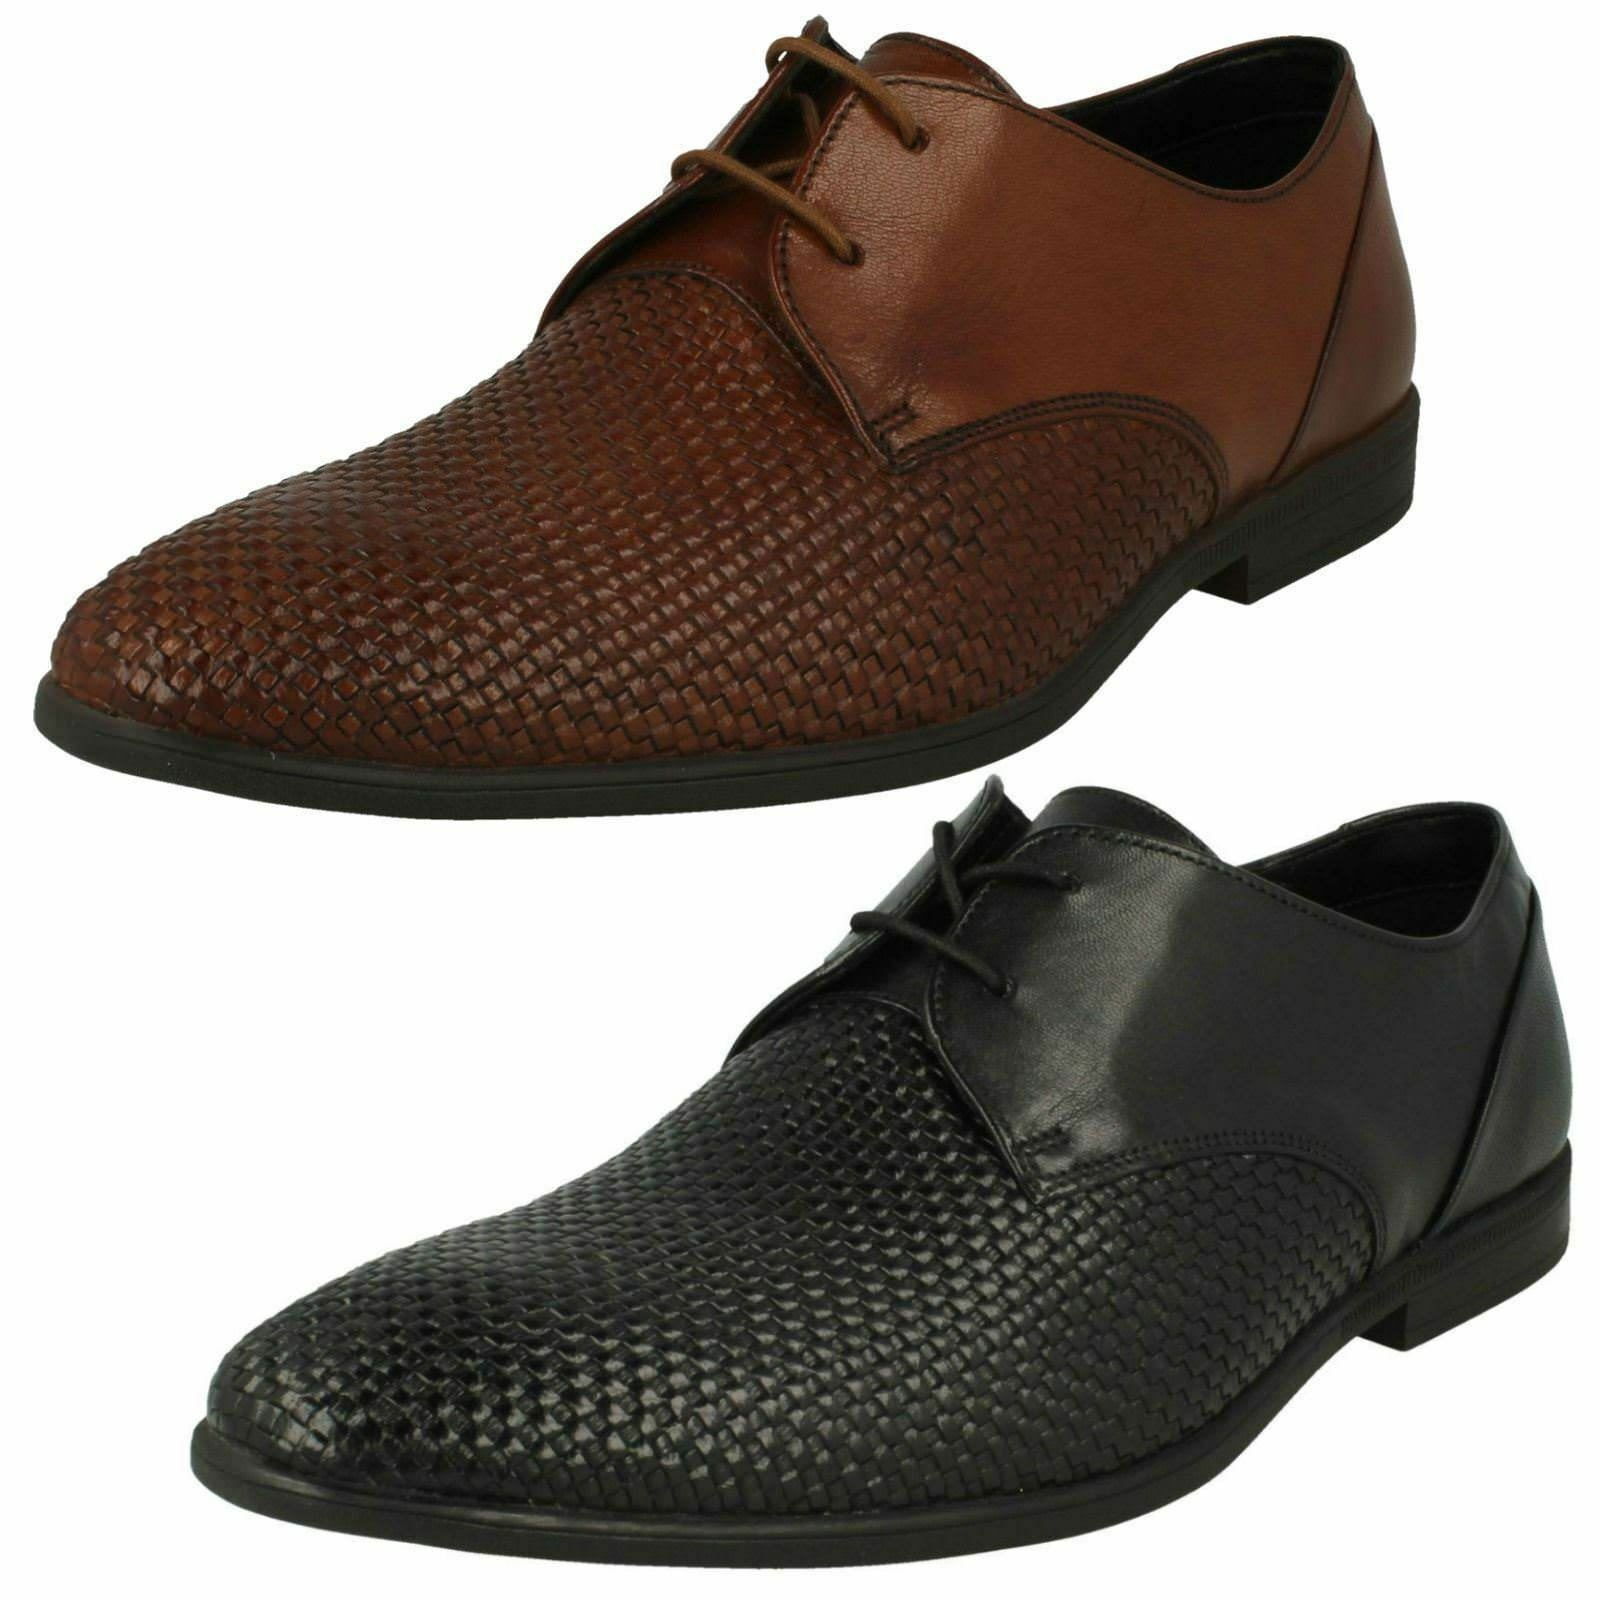 Clarks Bampton Weave Stylish Lace Up Smart Shoes